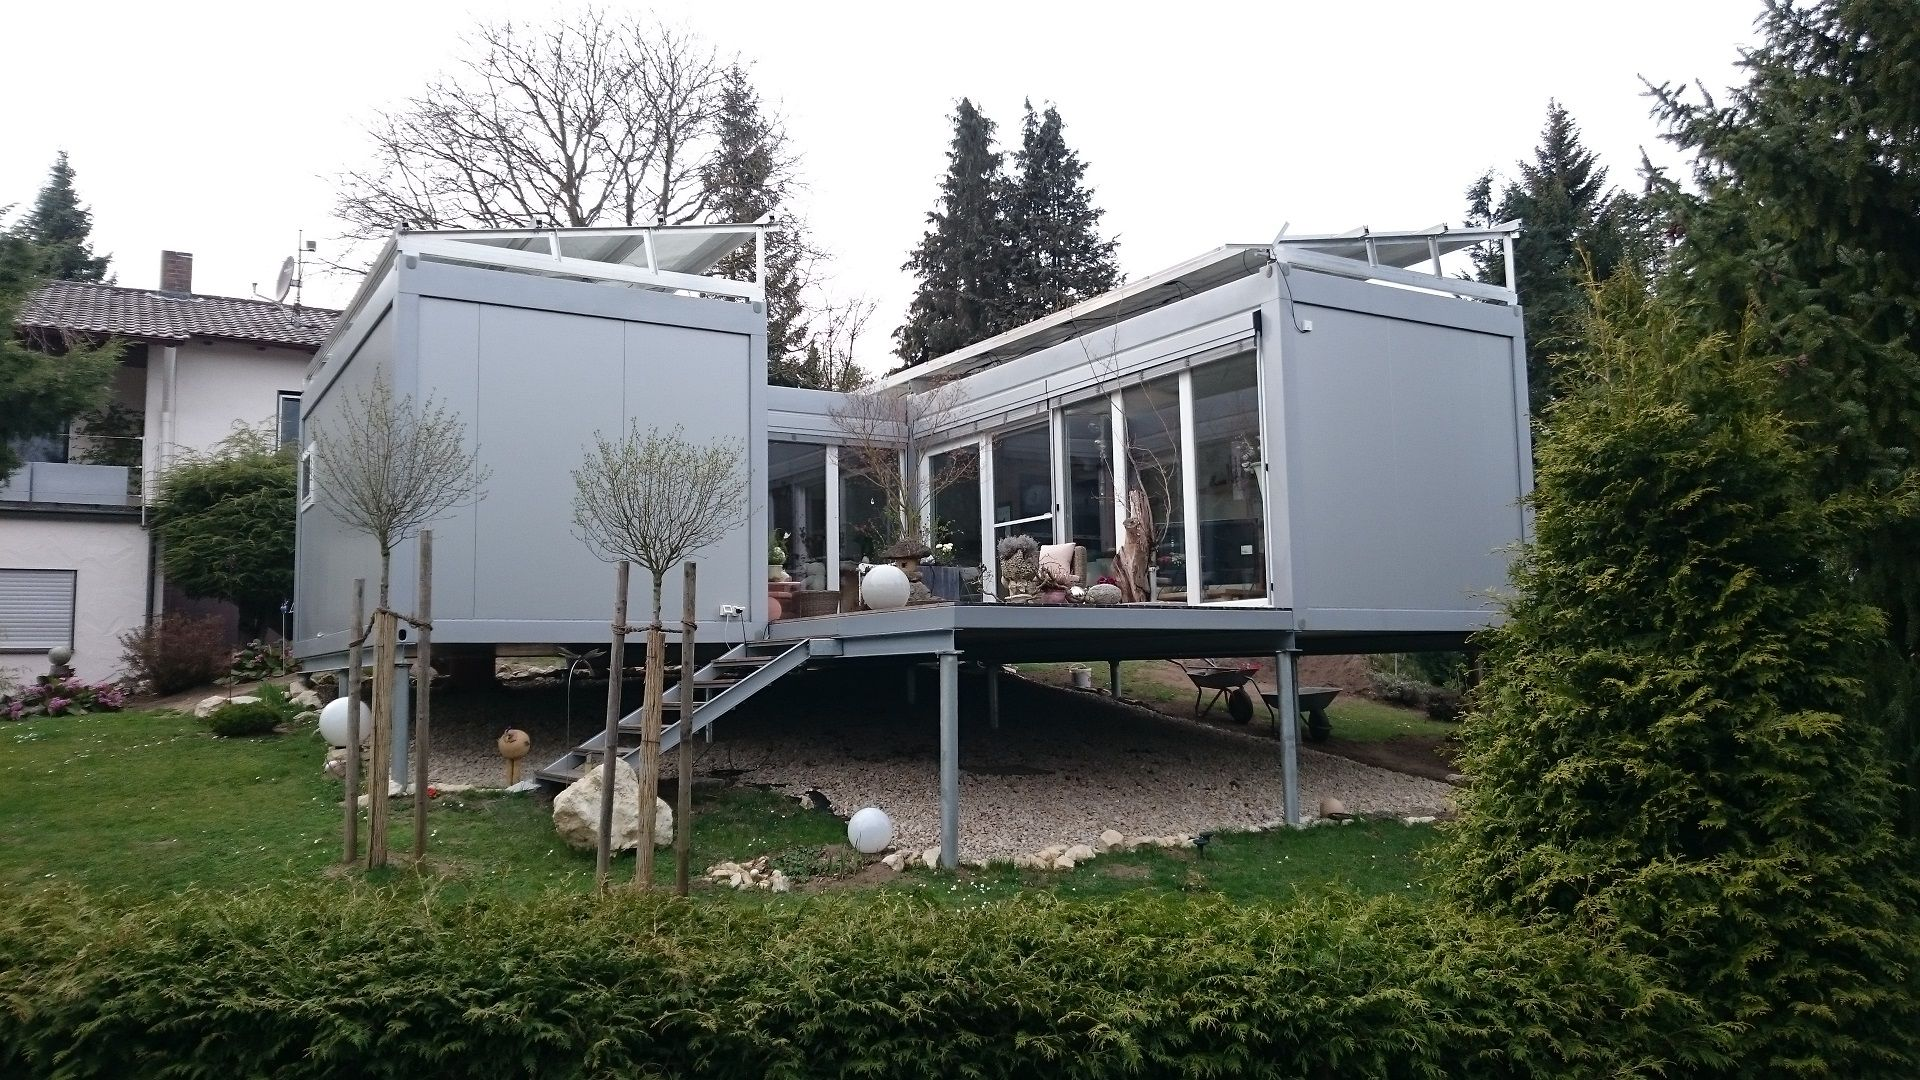 Wohnhauser Conhouse Anbieter Deutschland Small Home Inspiration